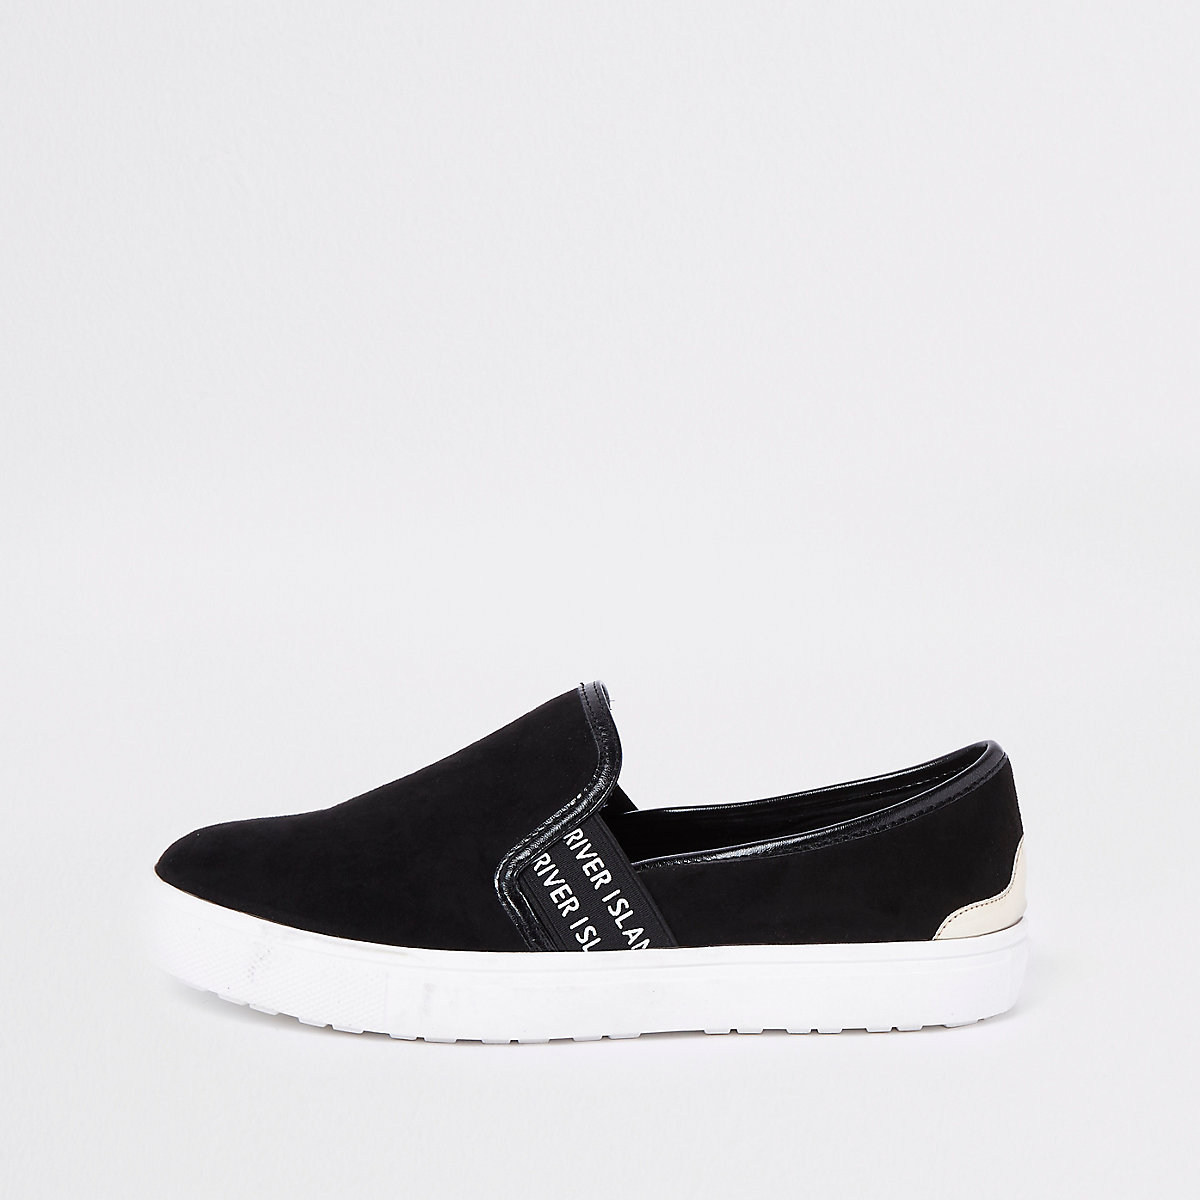 Black RI branded slip on plimsolls